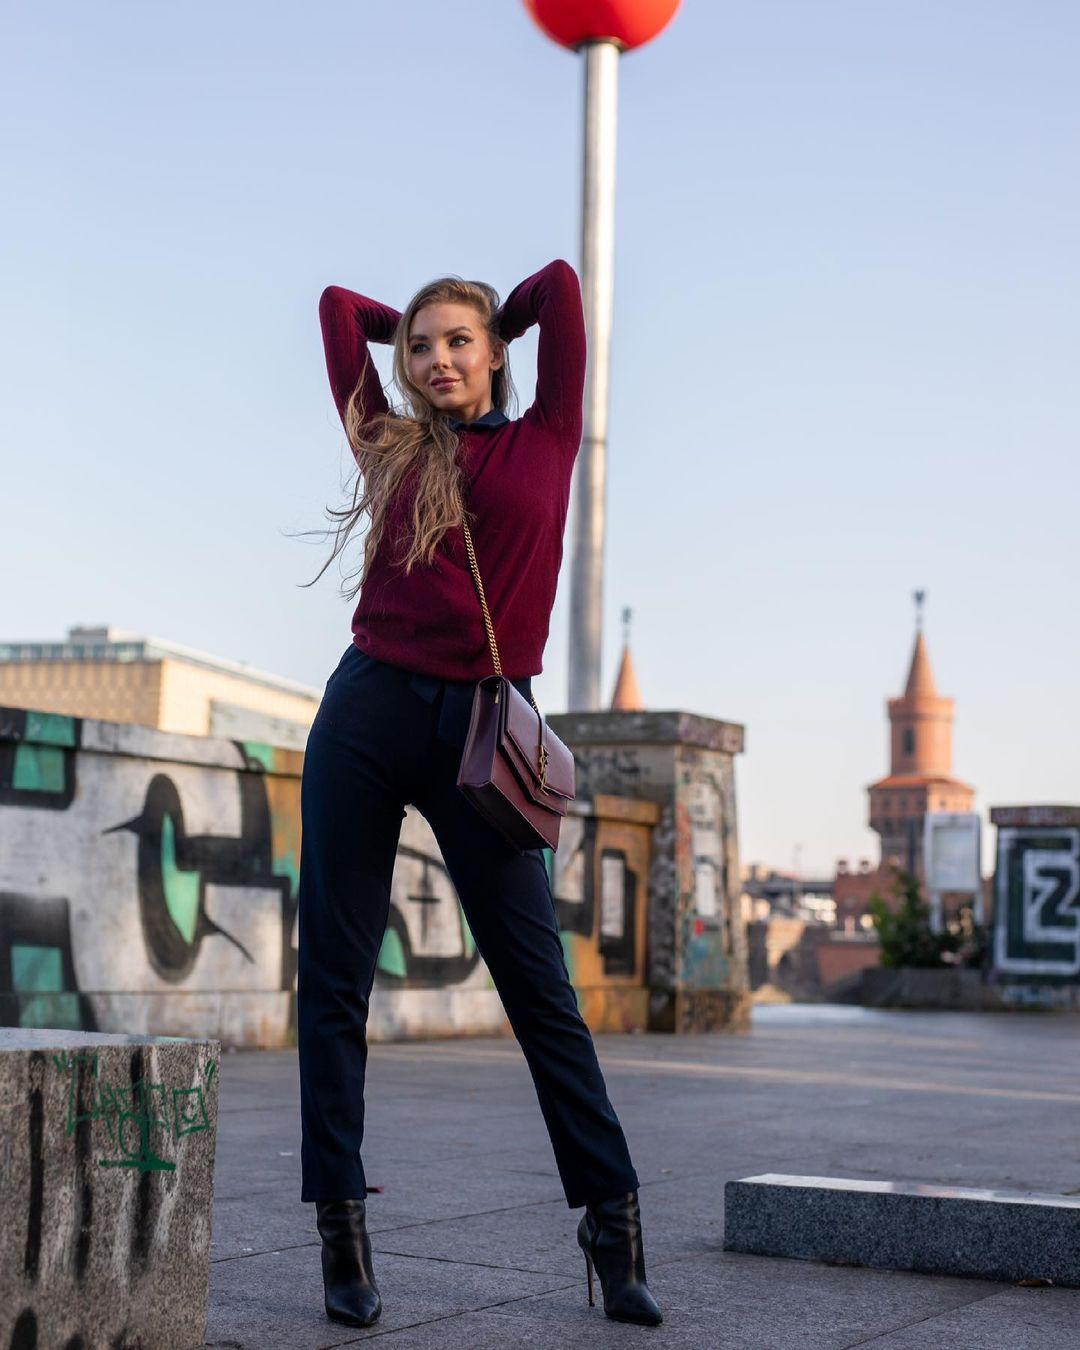 Elizaweta-Amalia-Wallpapers-Insta-Fit-Bio-4